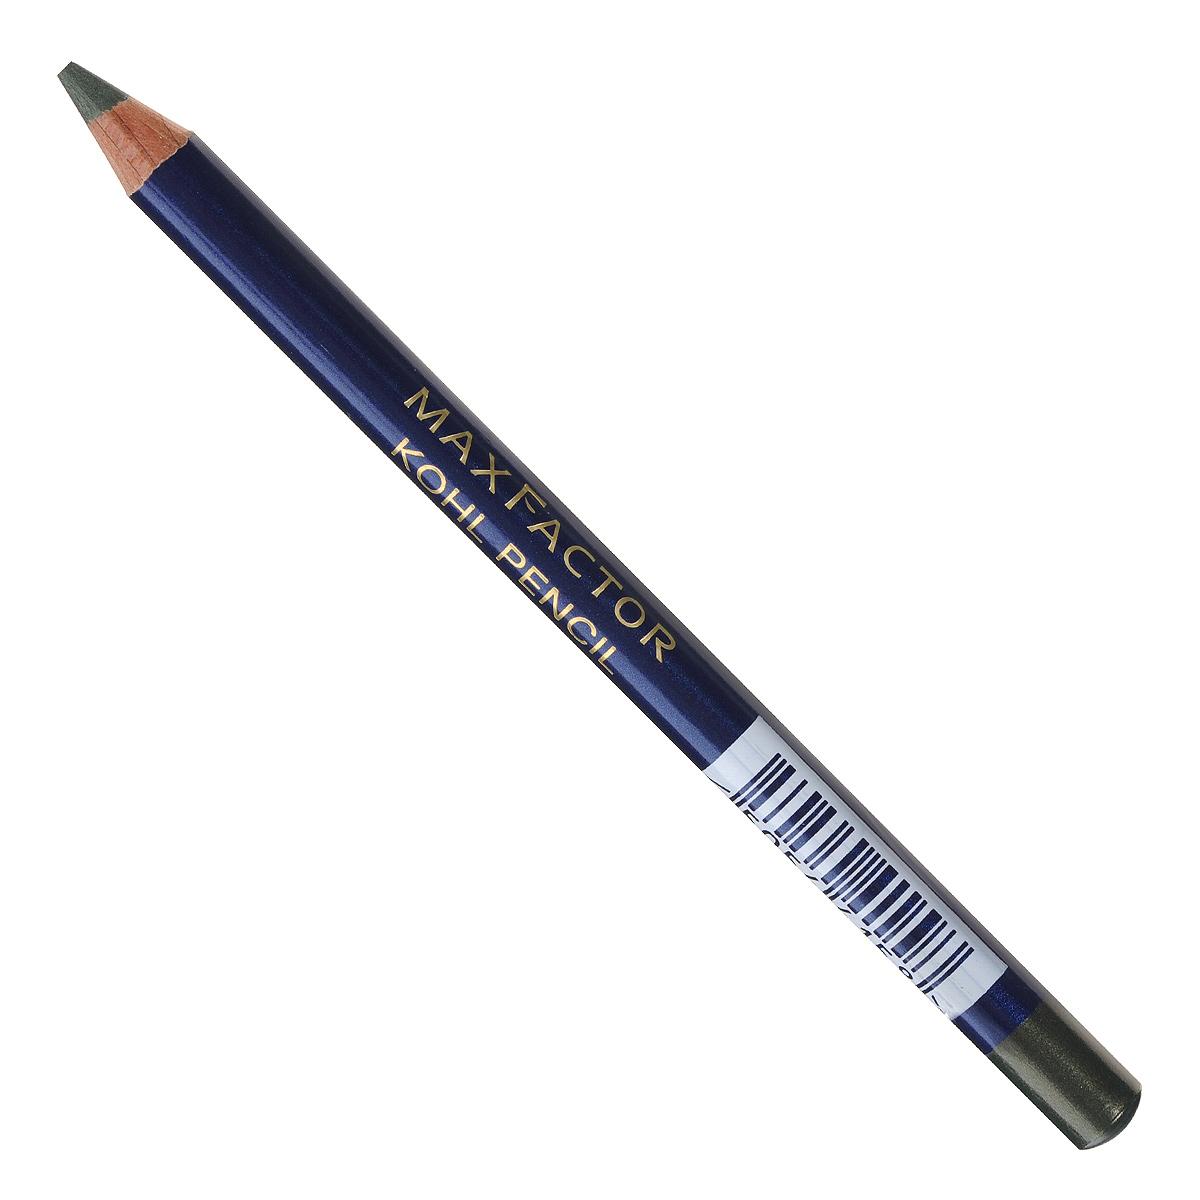 Max Factor Карандаш для глаз Kohl Pencil, тон №070 Olive, цвет: оливковый max factor карандаш для глаз liquid effect pencil тон 05 brown blaze цвет коричневый